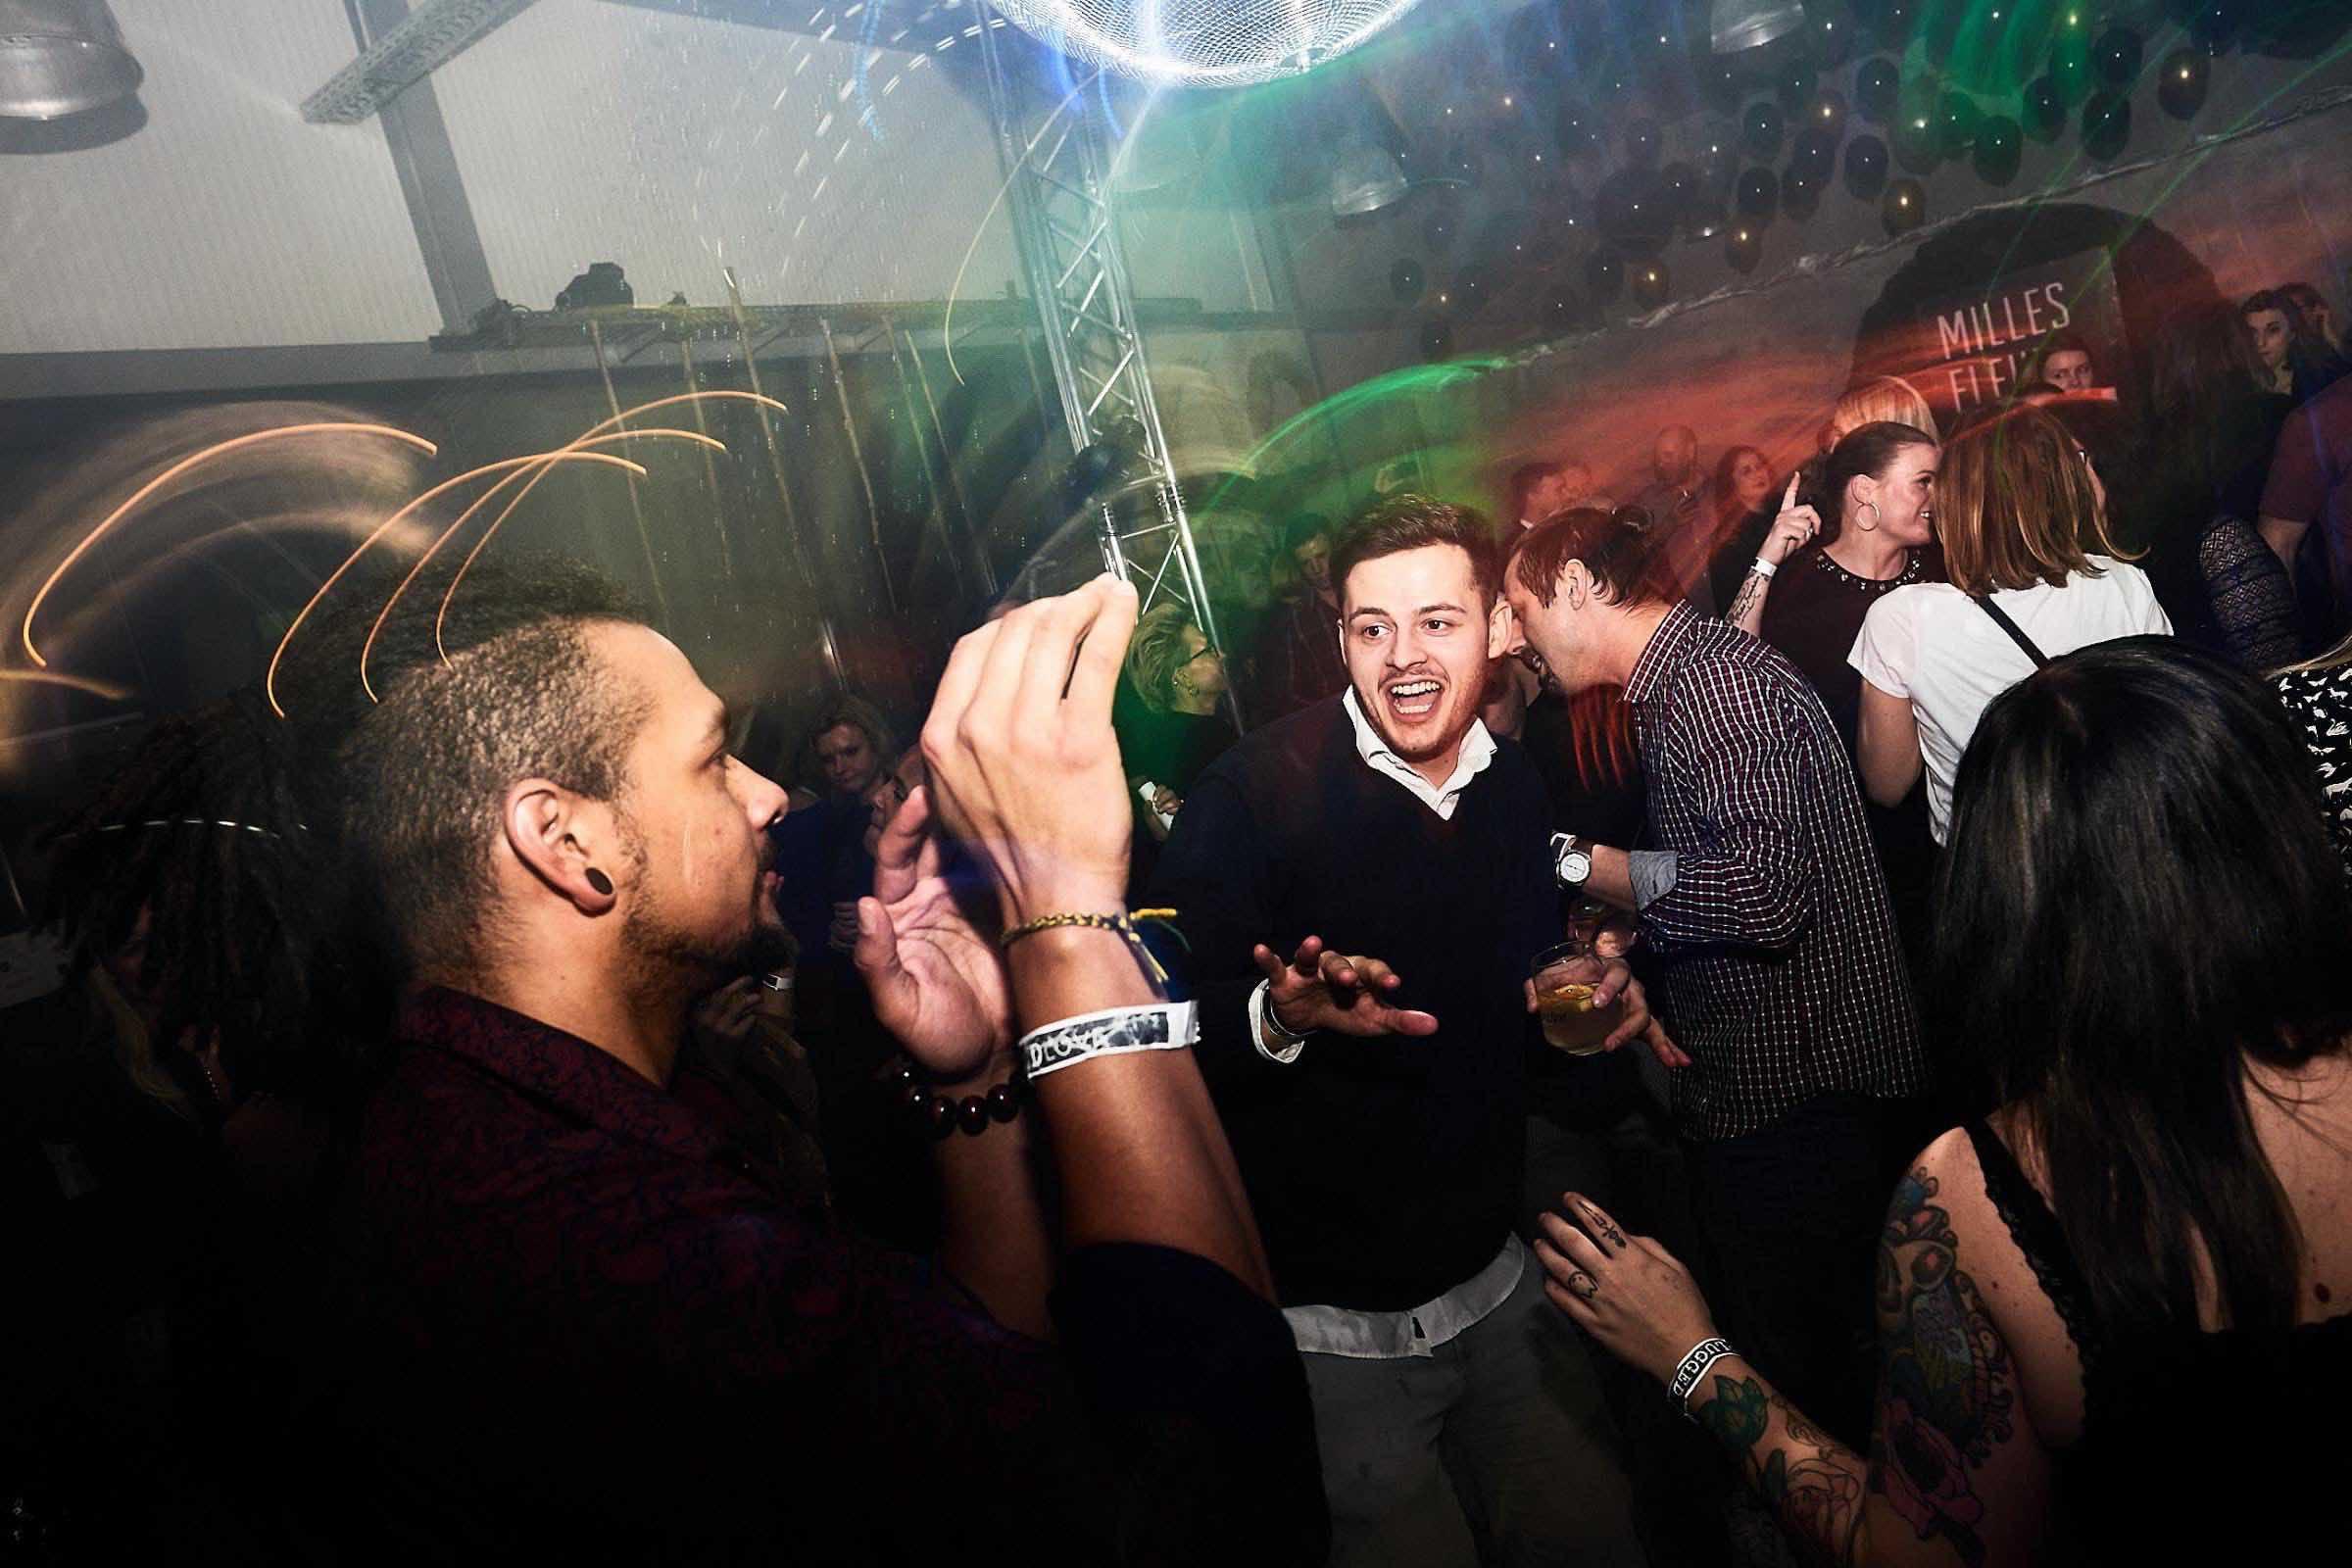 DJ | Geburtstag | DJ | Agentur | Hamburg | DJ | Messe | DJ | Firmenevent | Firmenfeier | DJ | Weihnachtsfeier | DJ | Sommerfest | DJ | Weihnachtsfeier | DJ | Party | Event | Buchen | Anfragen | Hamburgfeiert